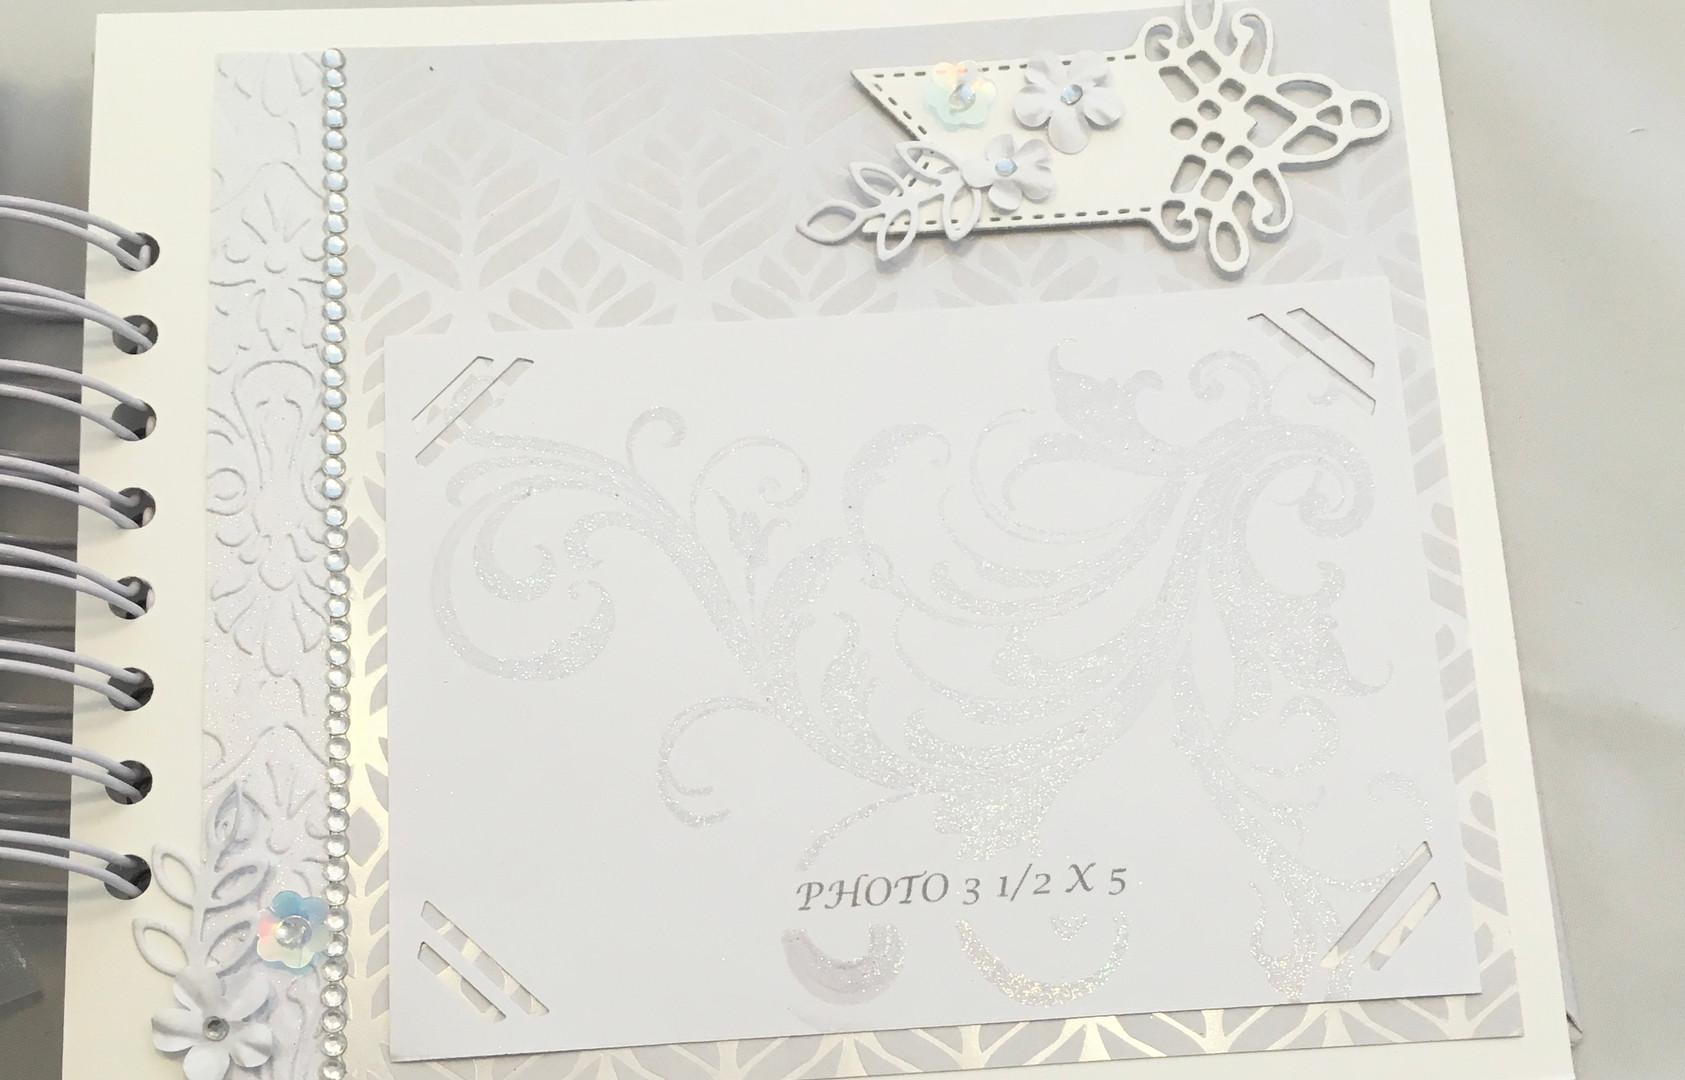 Album-Petit/Small (Thématique mariage) $50